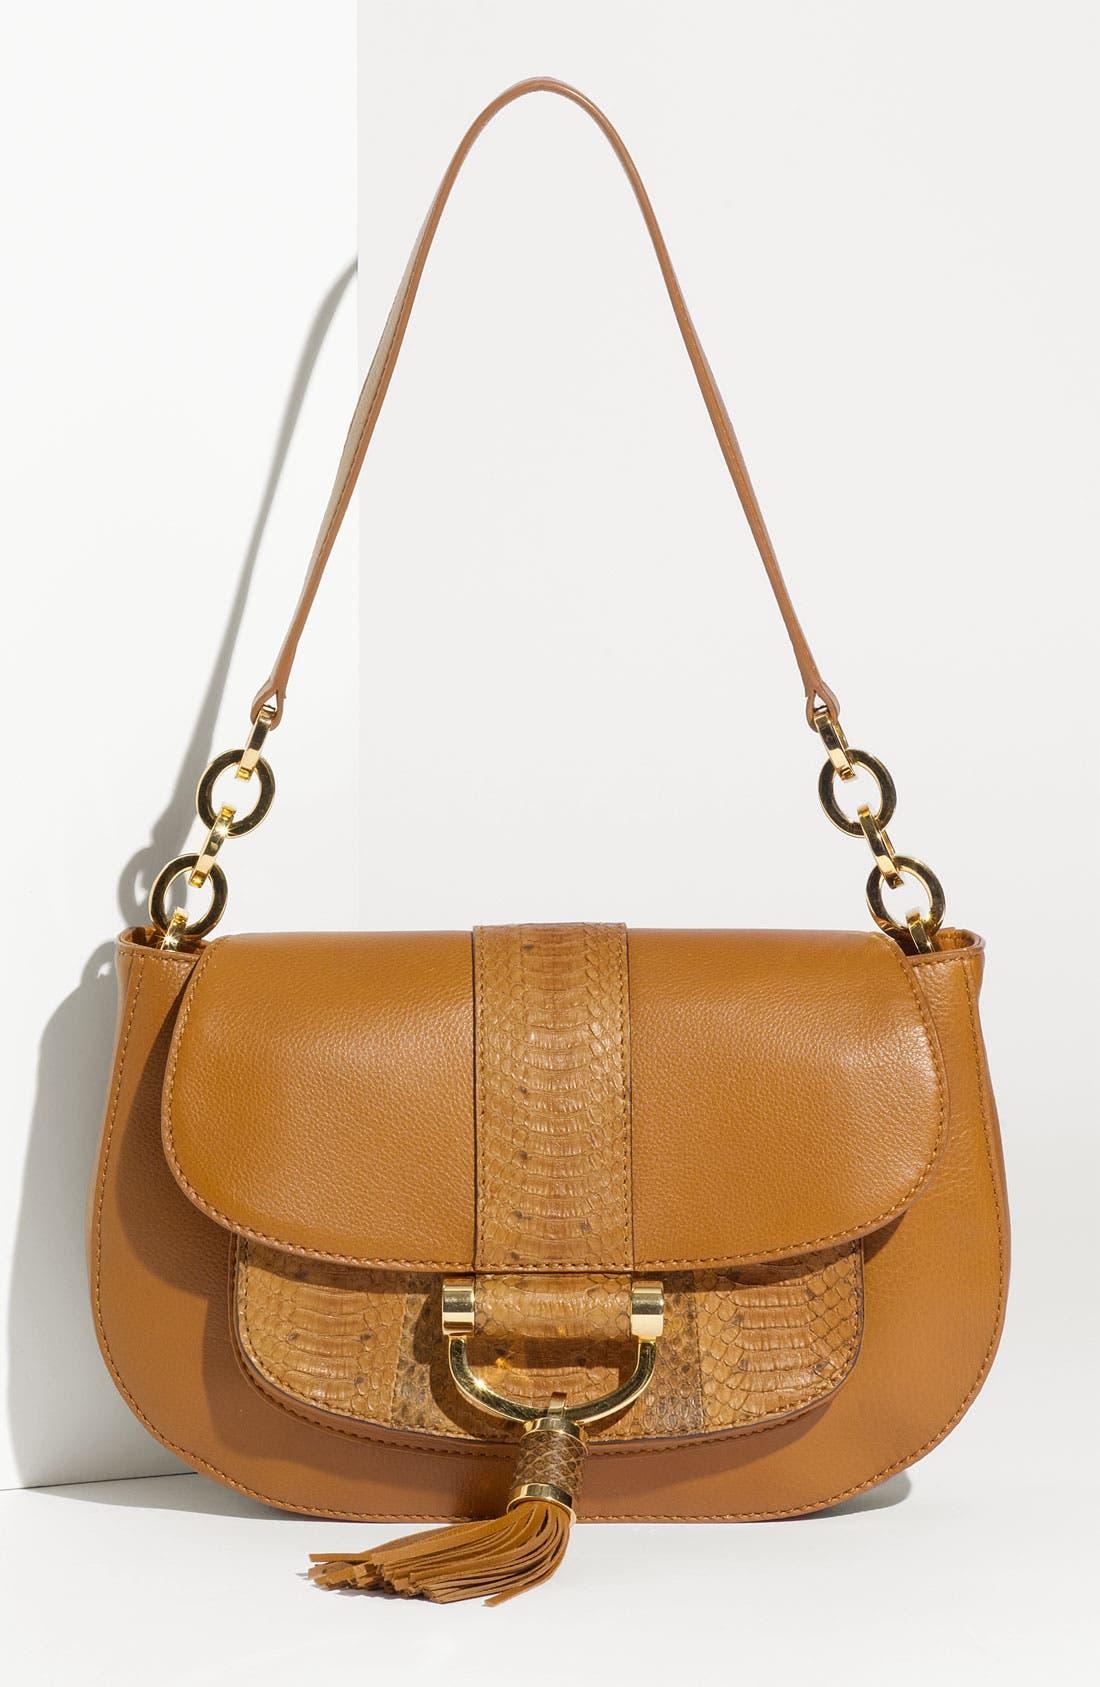 Main Image - Michael Kors 'Tonne' Shoulder Bag